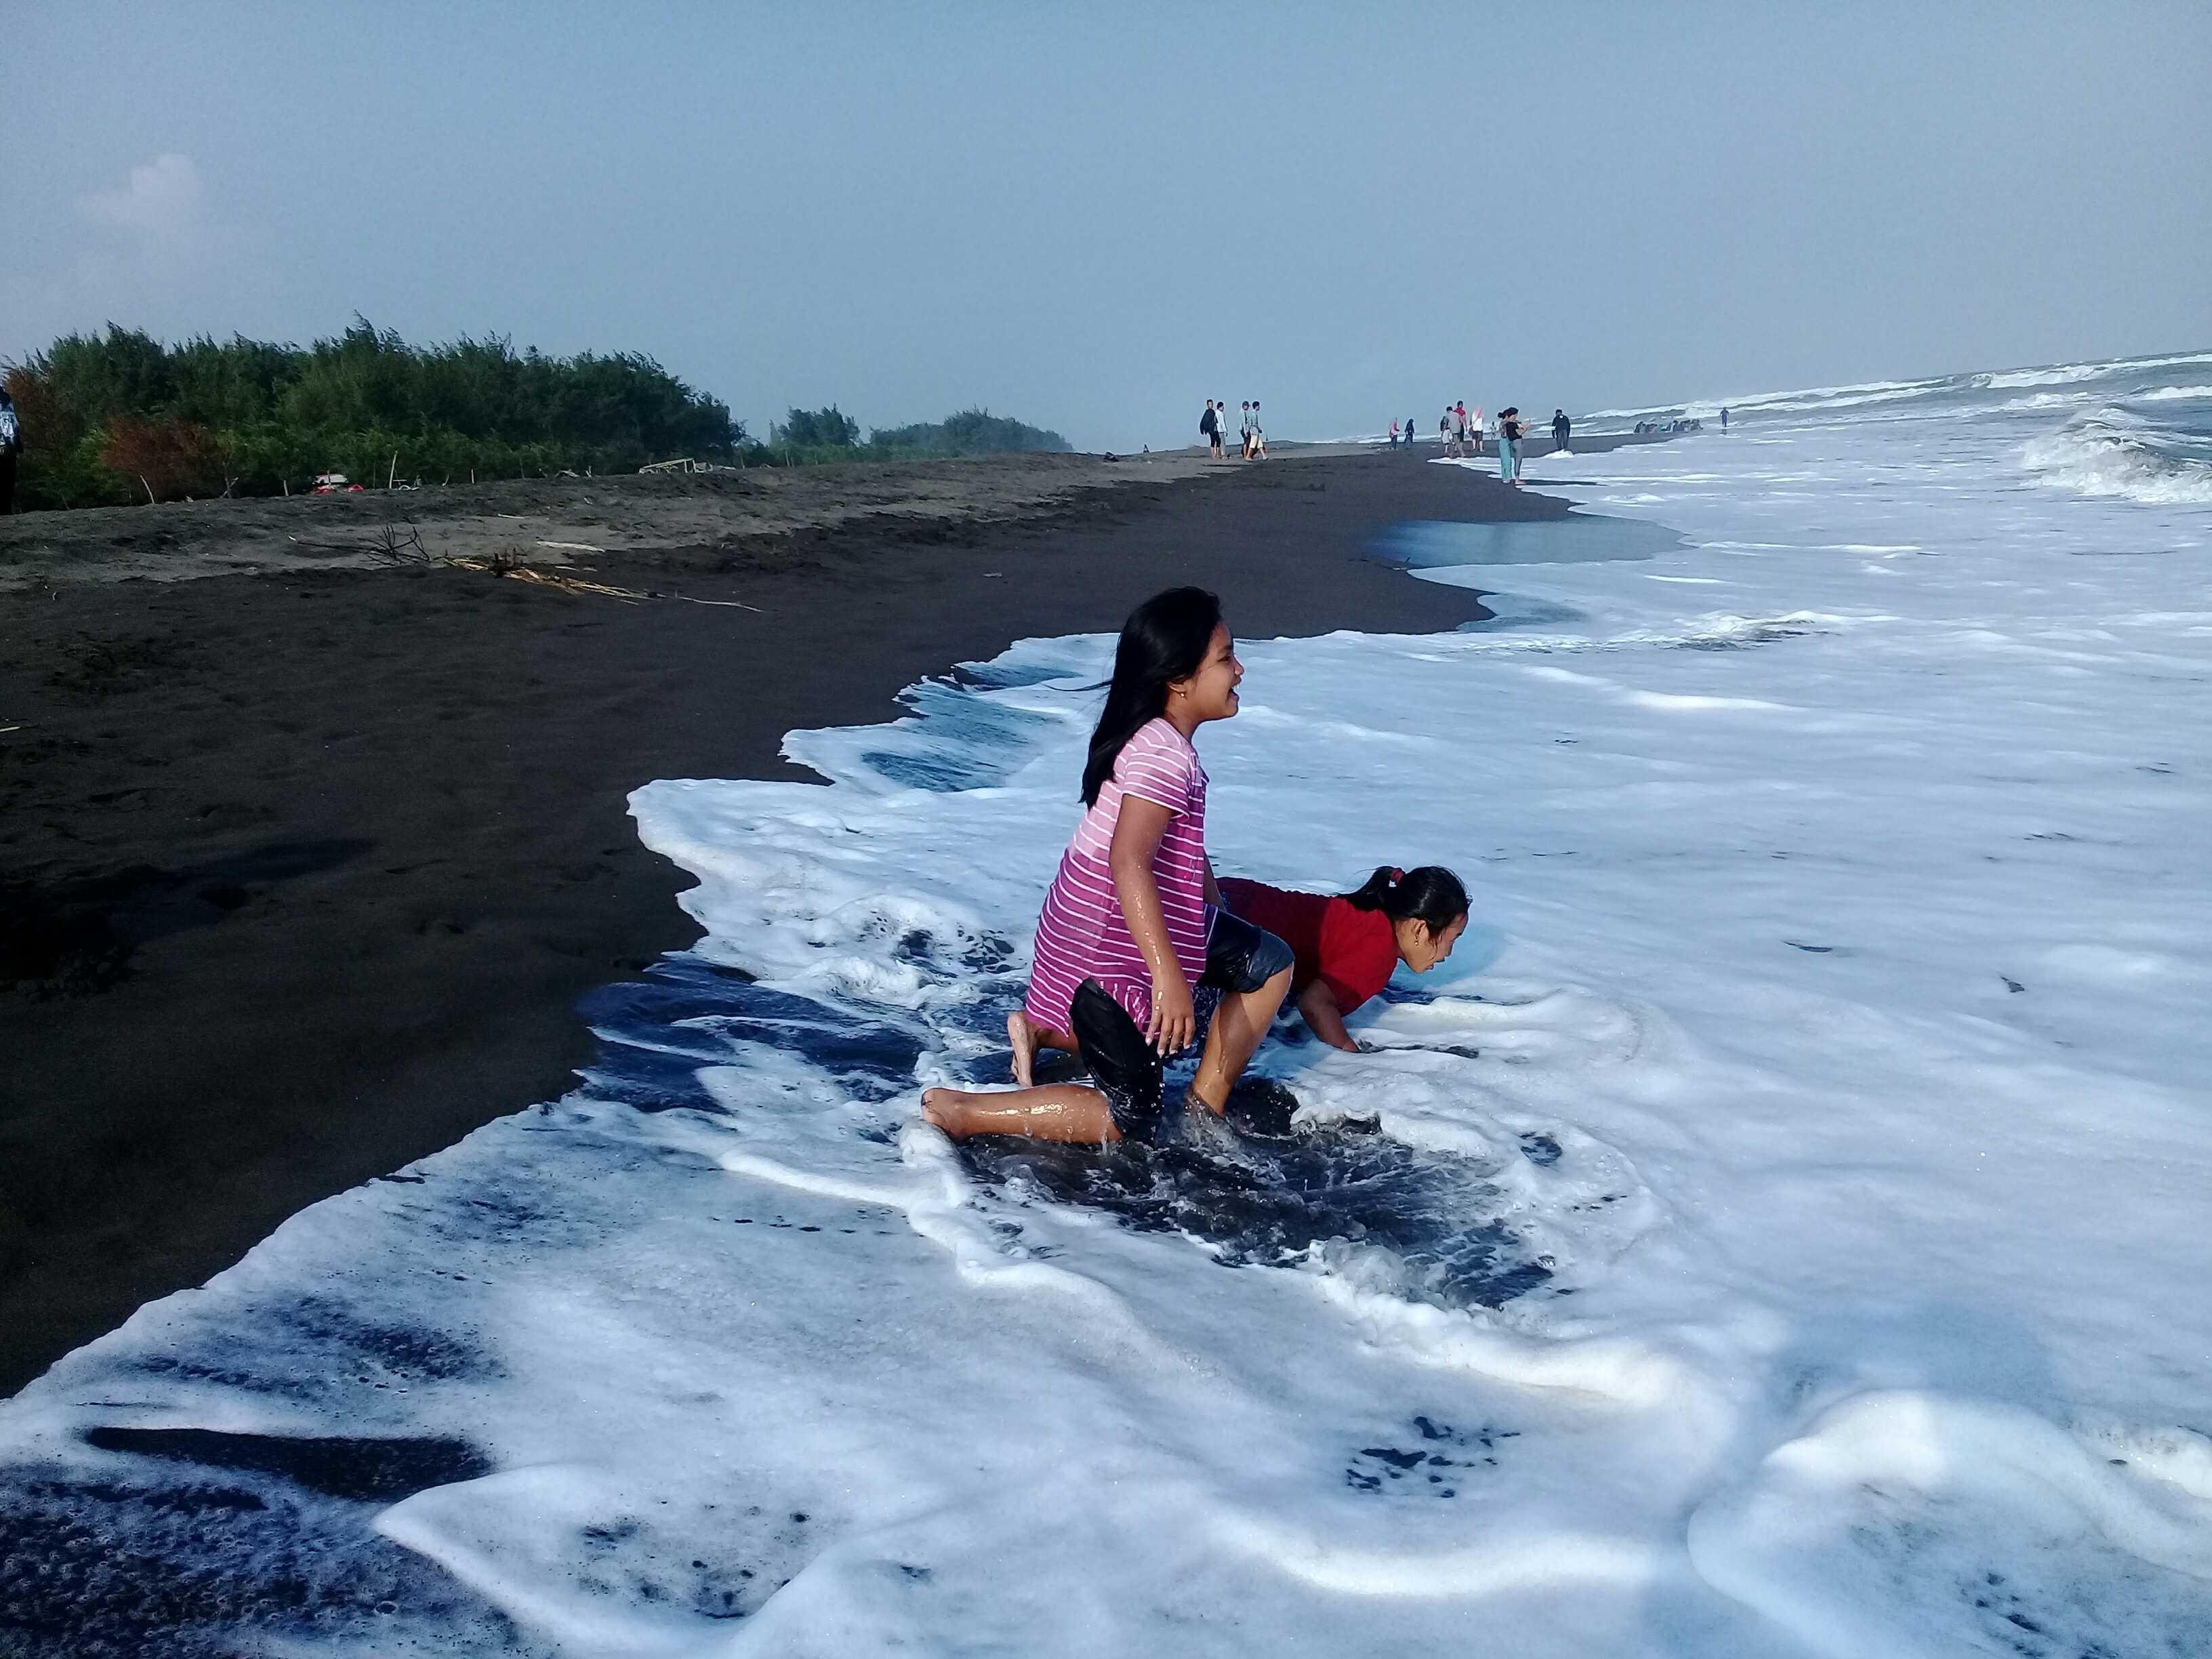 Pantai Sodong Cilacap Steemkr Kabupaten Jawa Tengah Natural Bersih Kab